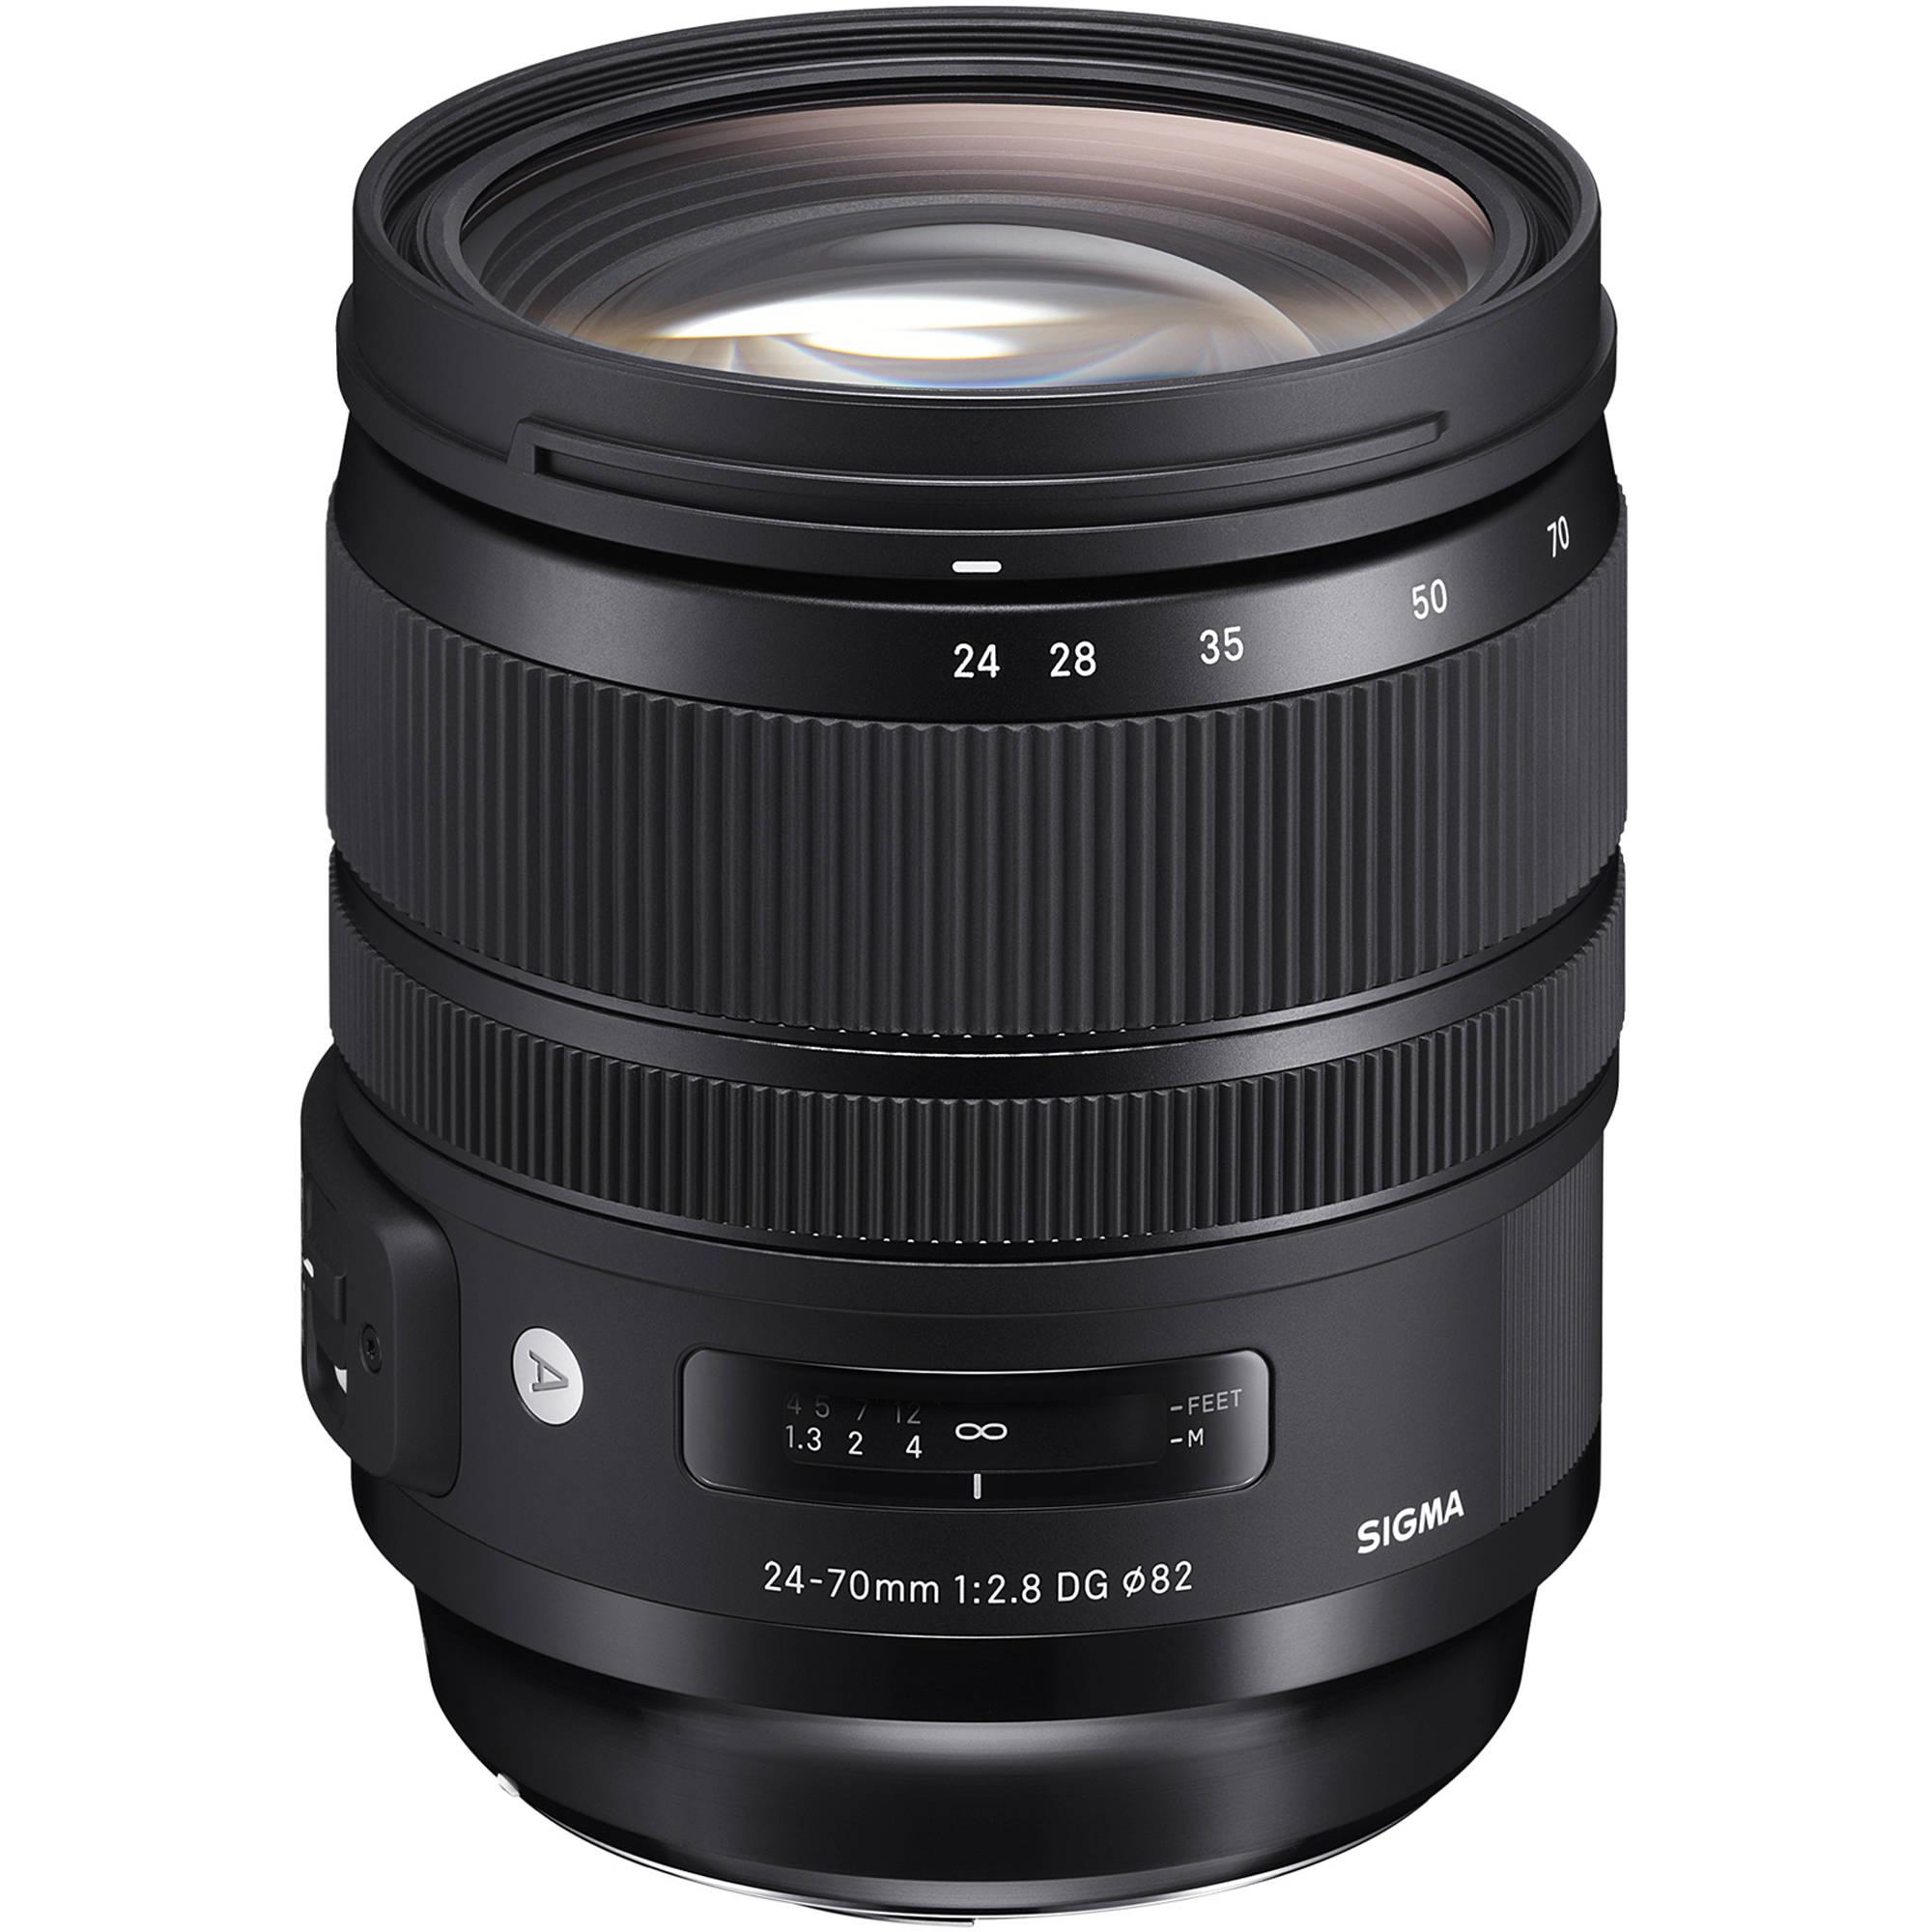 Sigma 24-70mm f/2.8 DG OS HSM Art Lens for Canon EF 576954 B&H